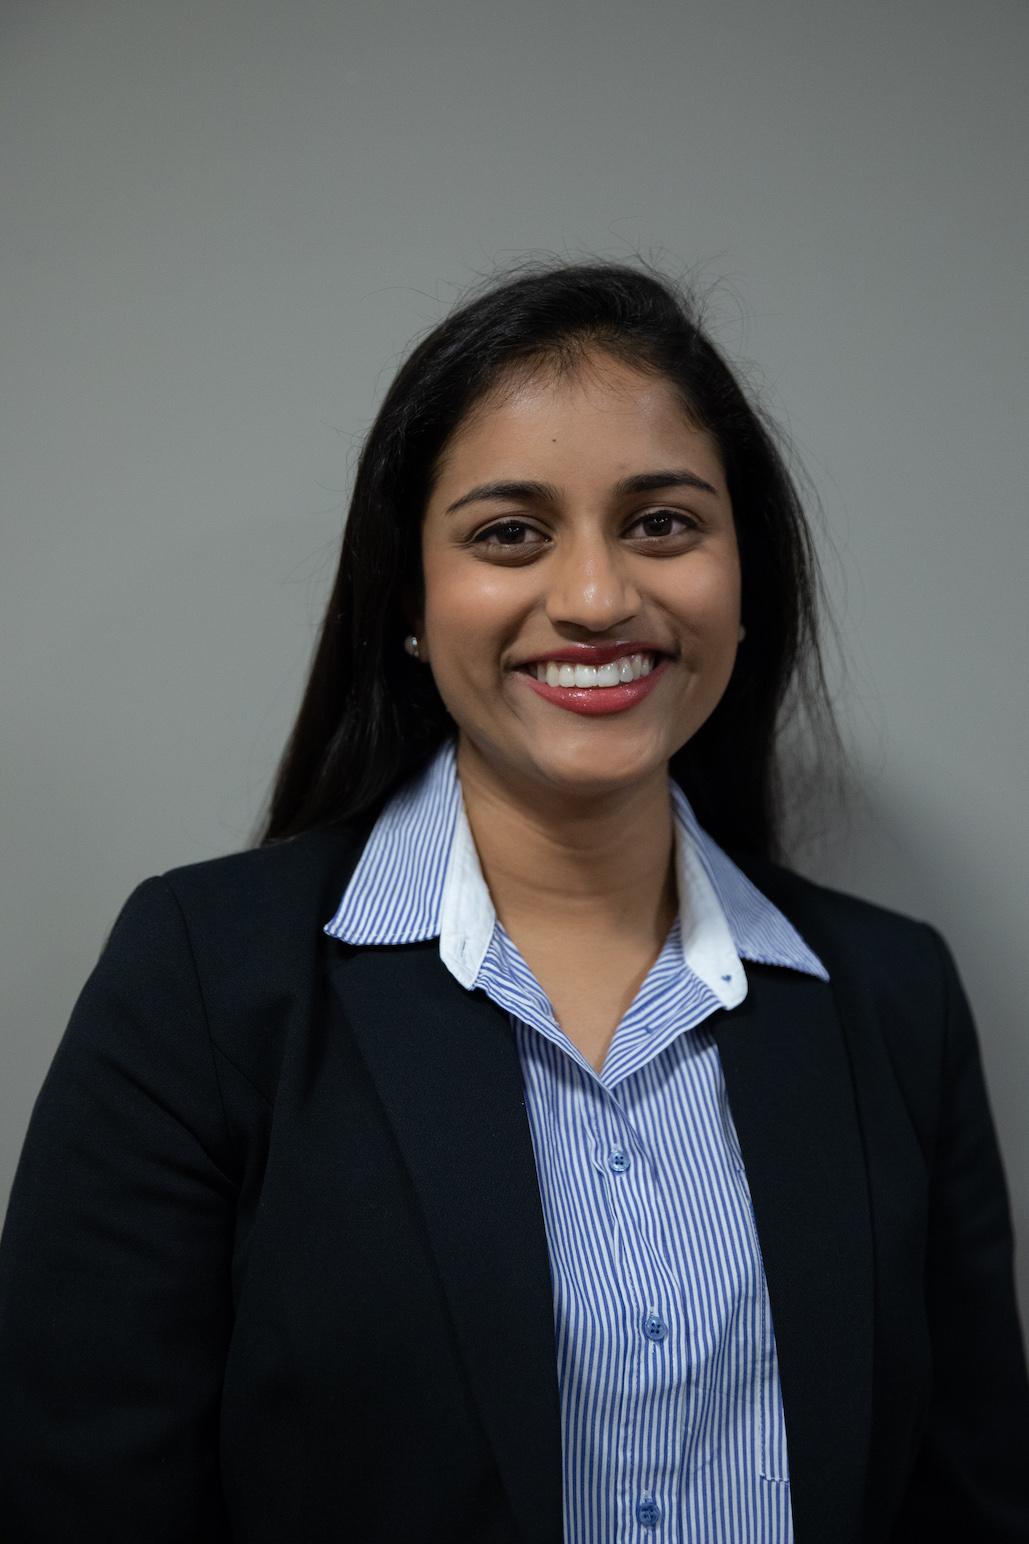 Ratna Patel